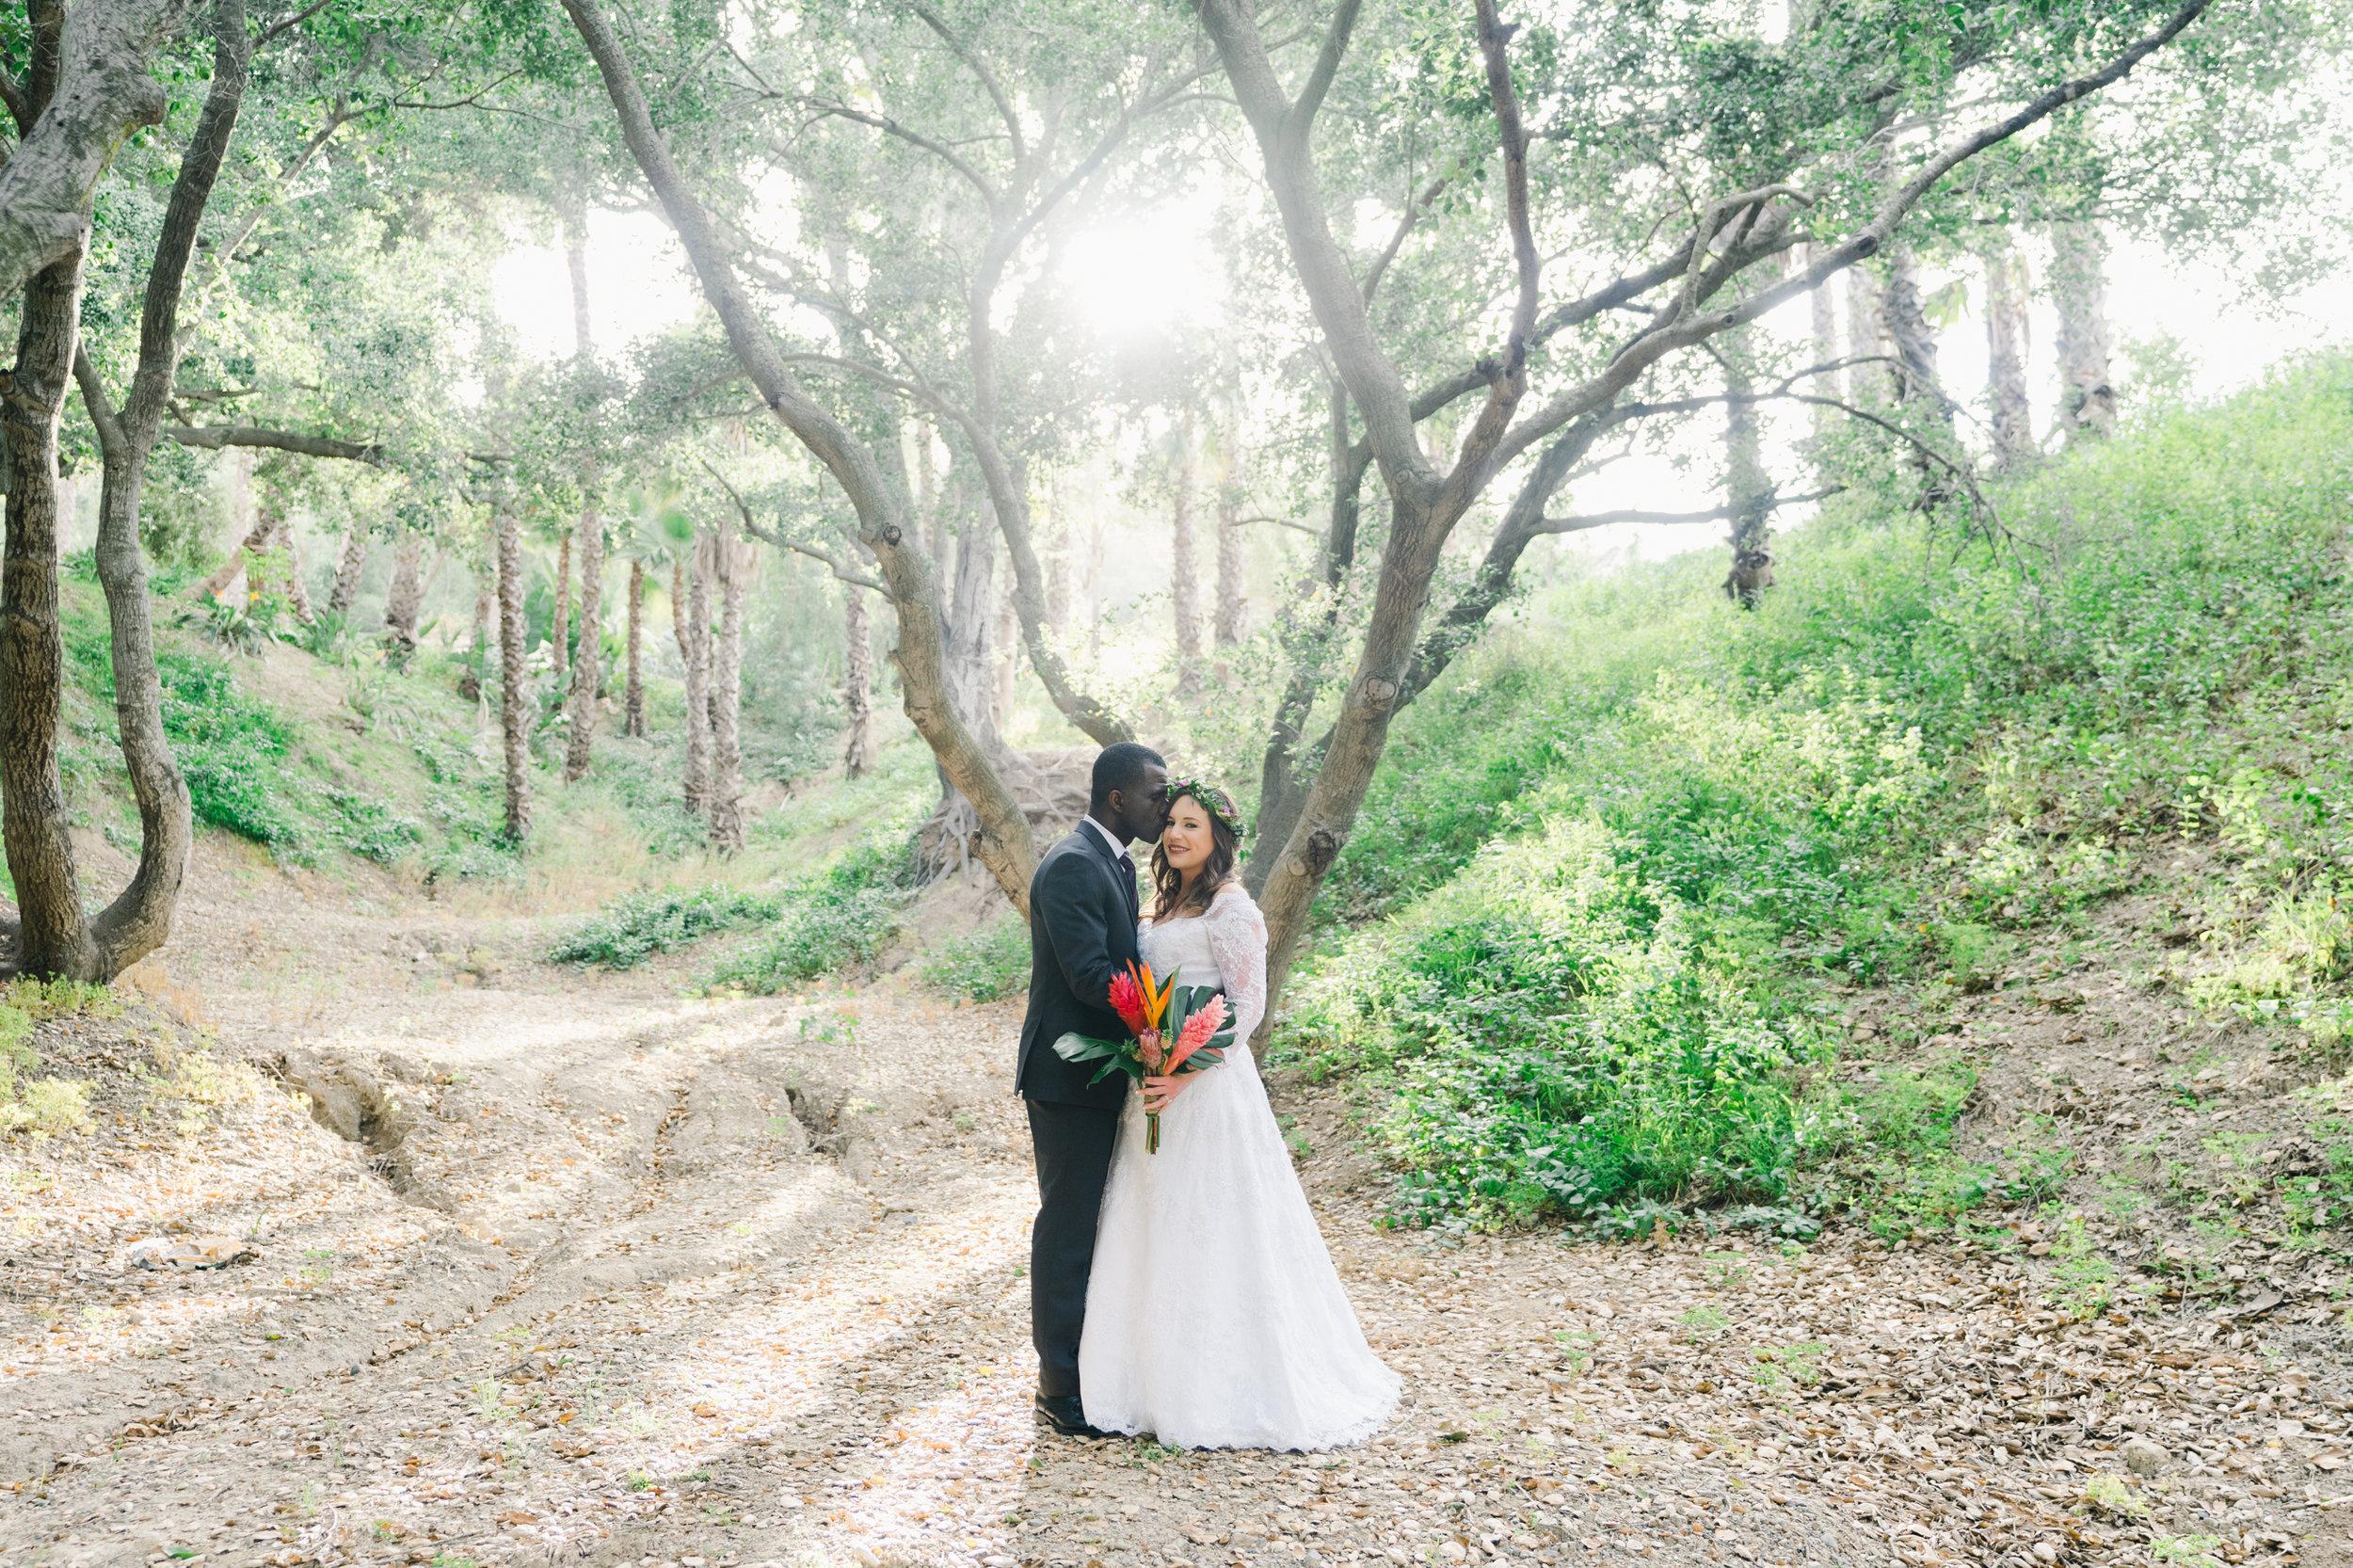 rancho-las-lomas-wedding-kelsey-sim_0169.JPG